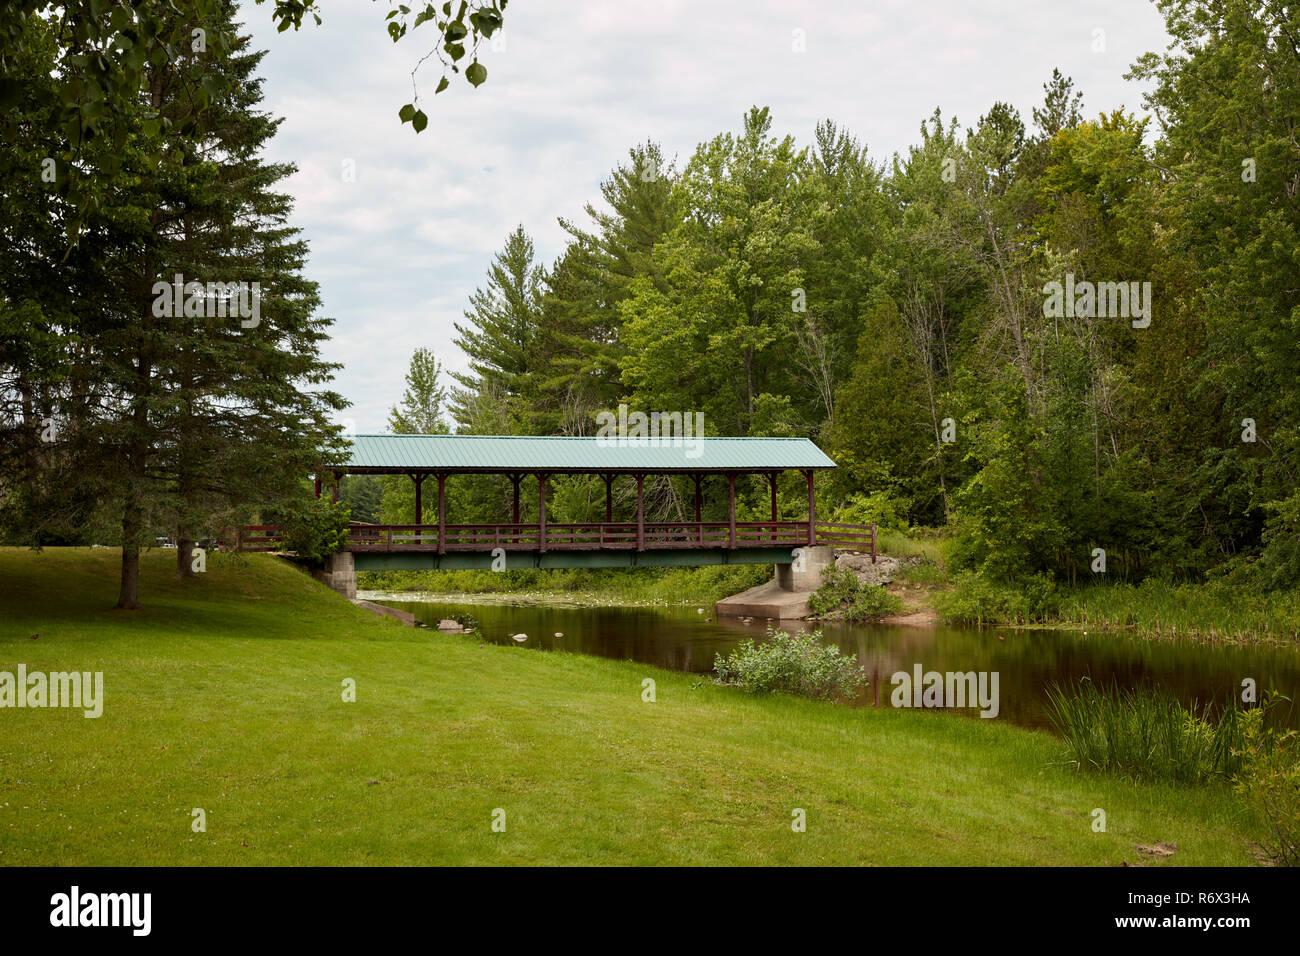 Covered bridge in Sunken Lake Park in northern Michigan - Stock Image